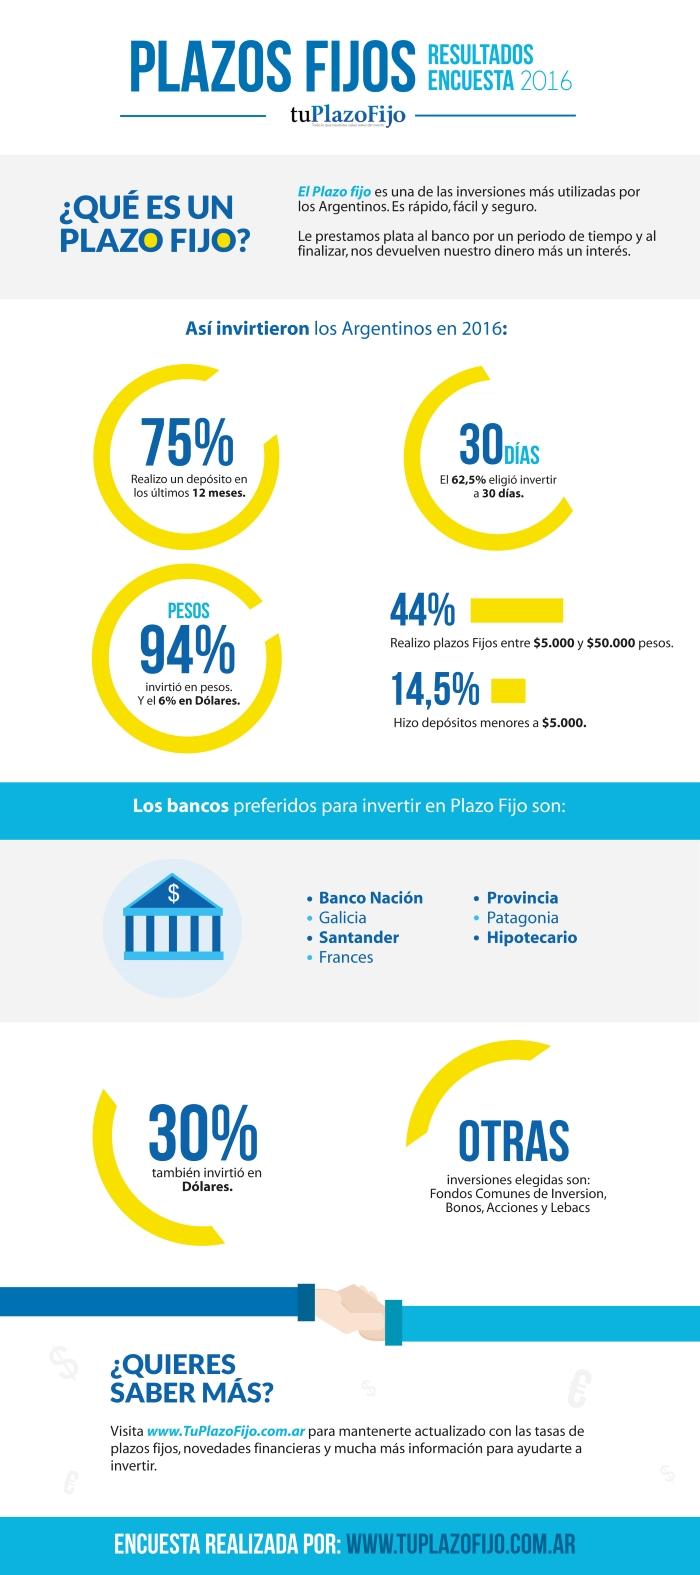 Infografia Plazos Fijos Argentina 2016